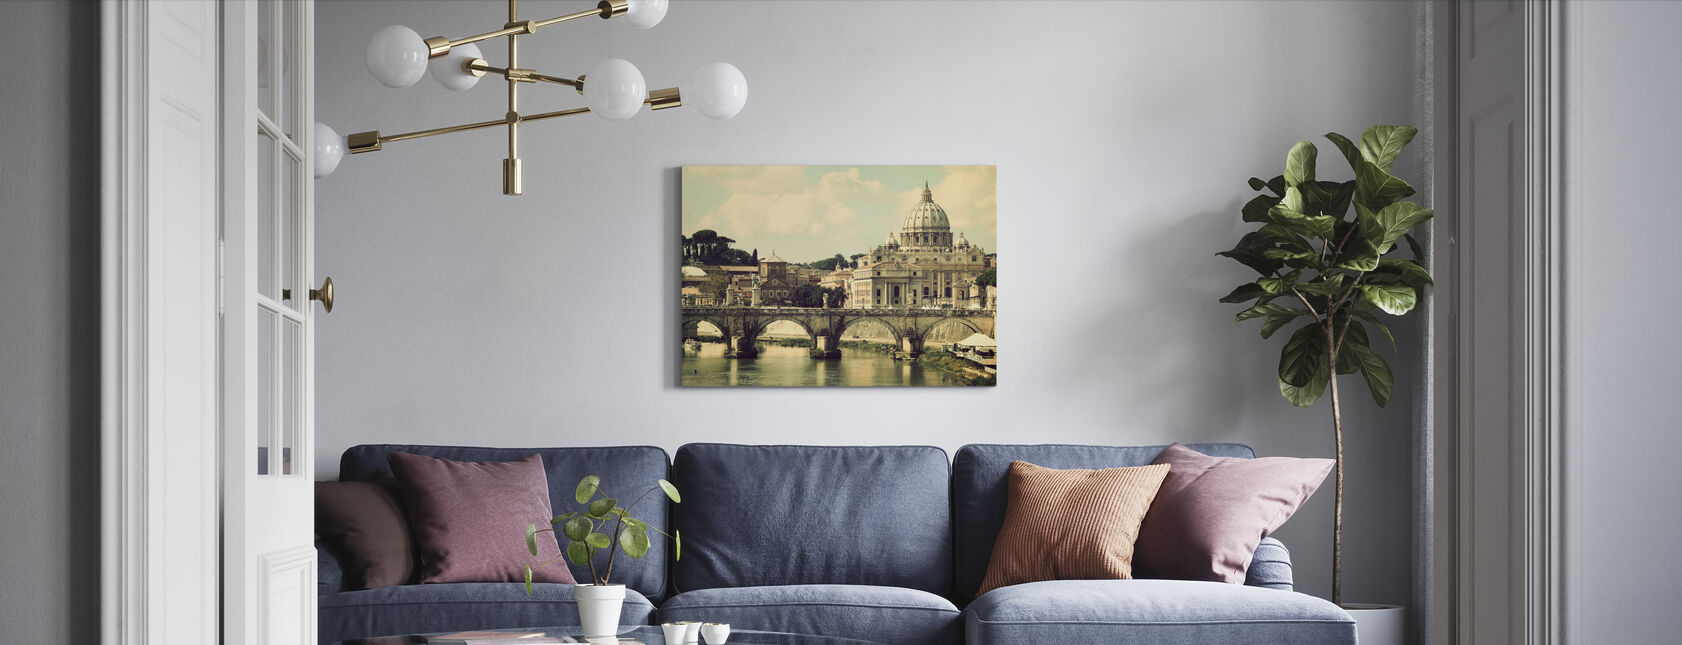 Rome - Zonnig San Pietro - Canvas print - Woonkamer